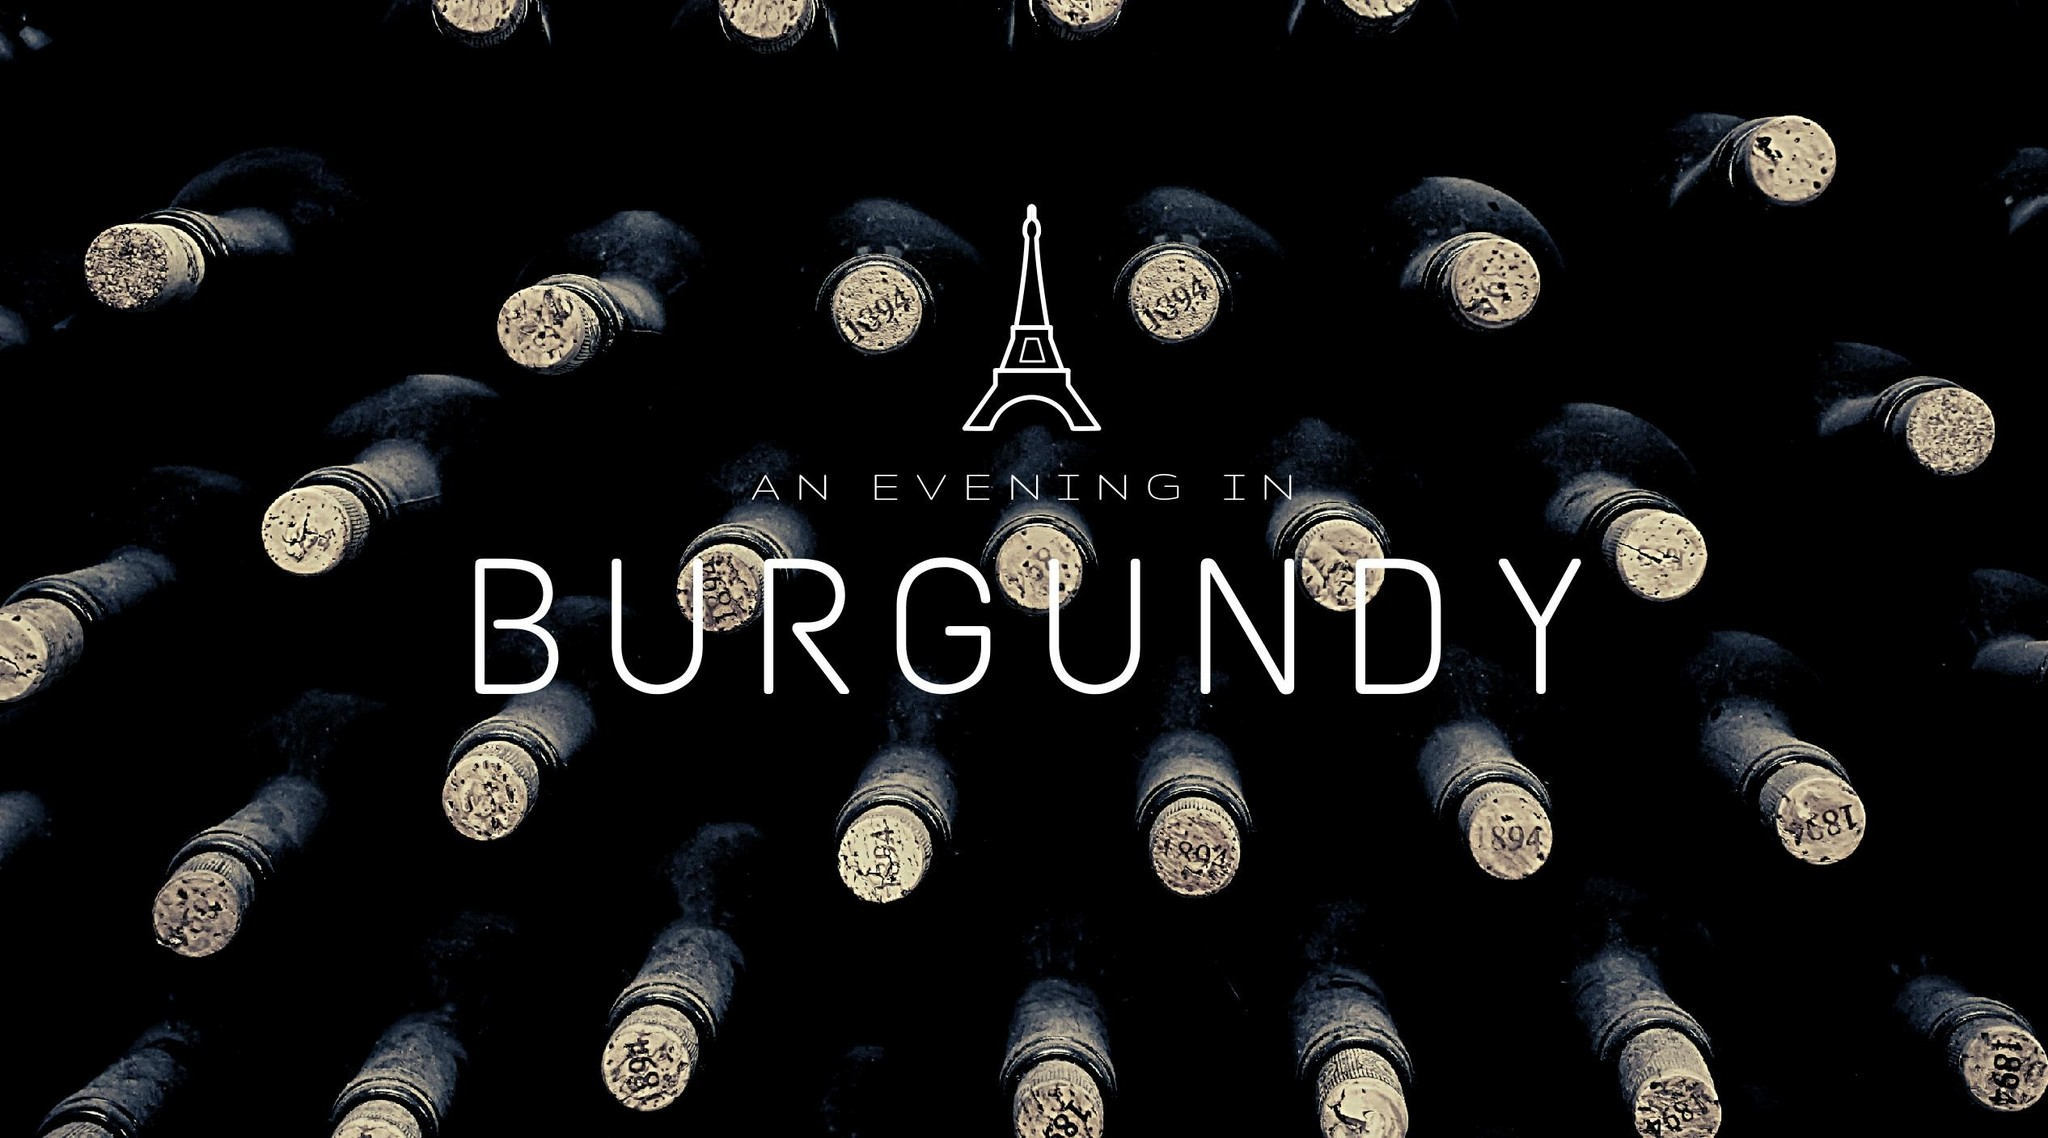 An Evening in Burgundy